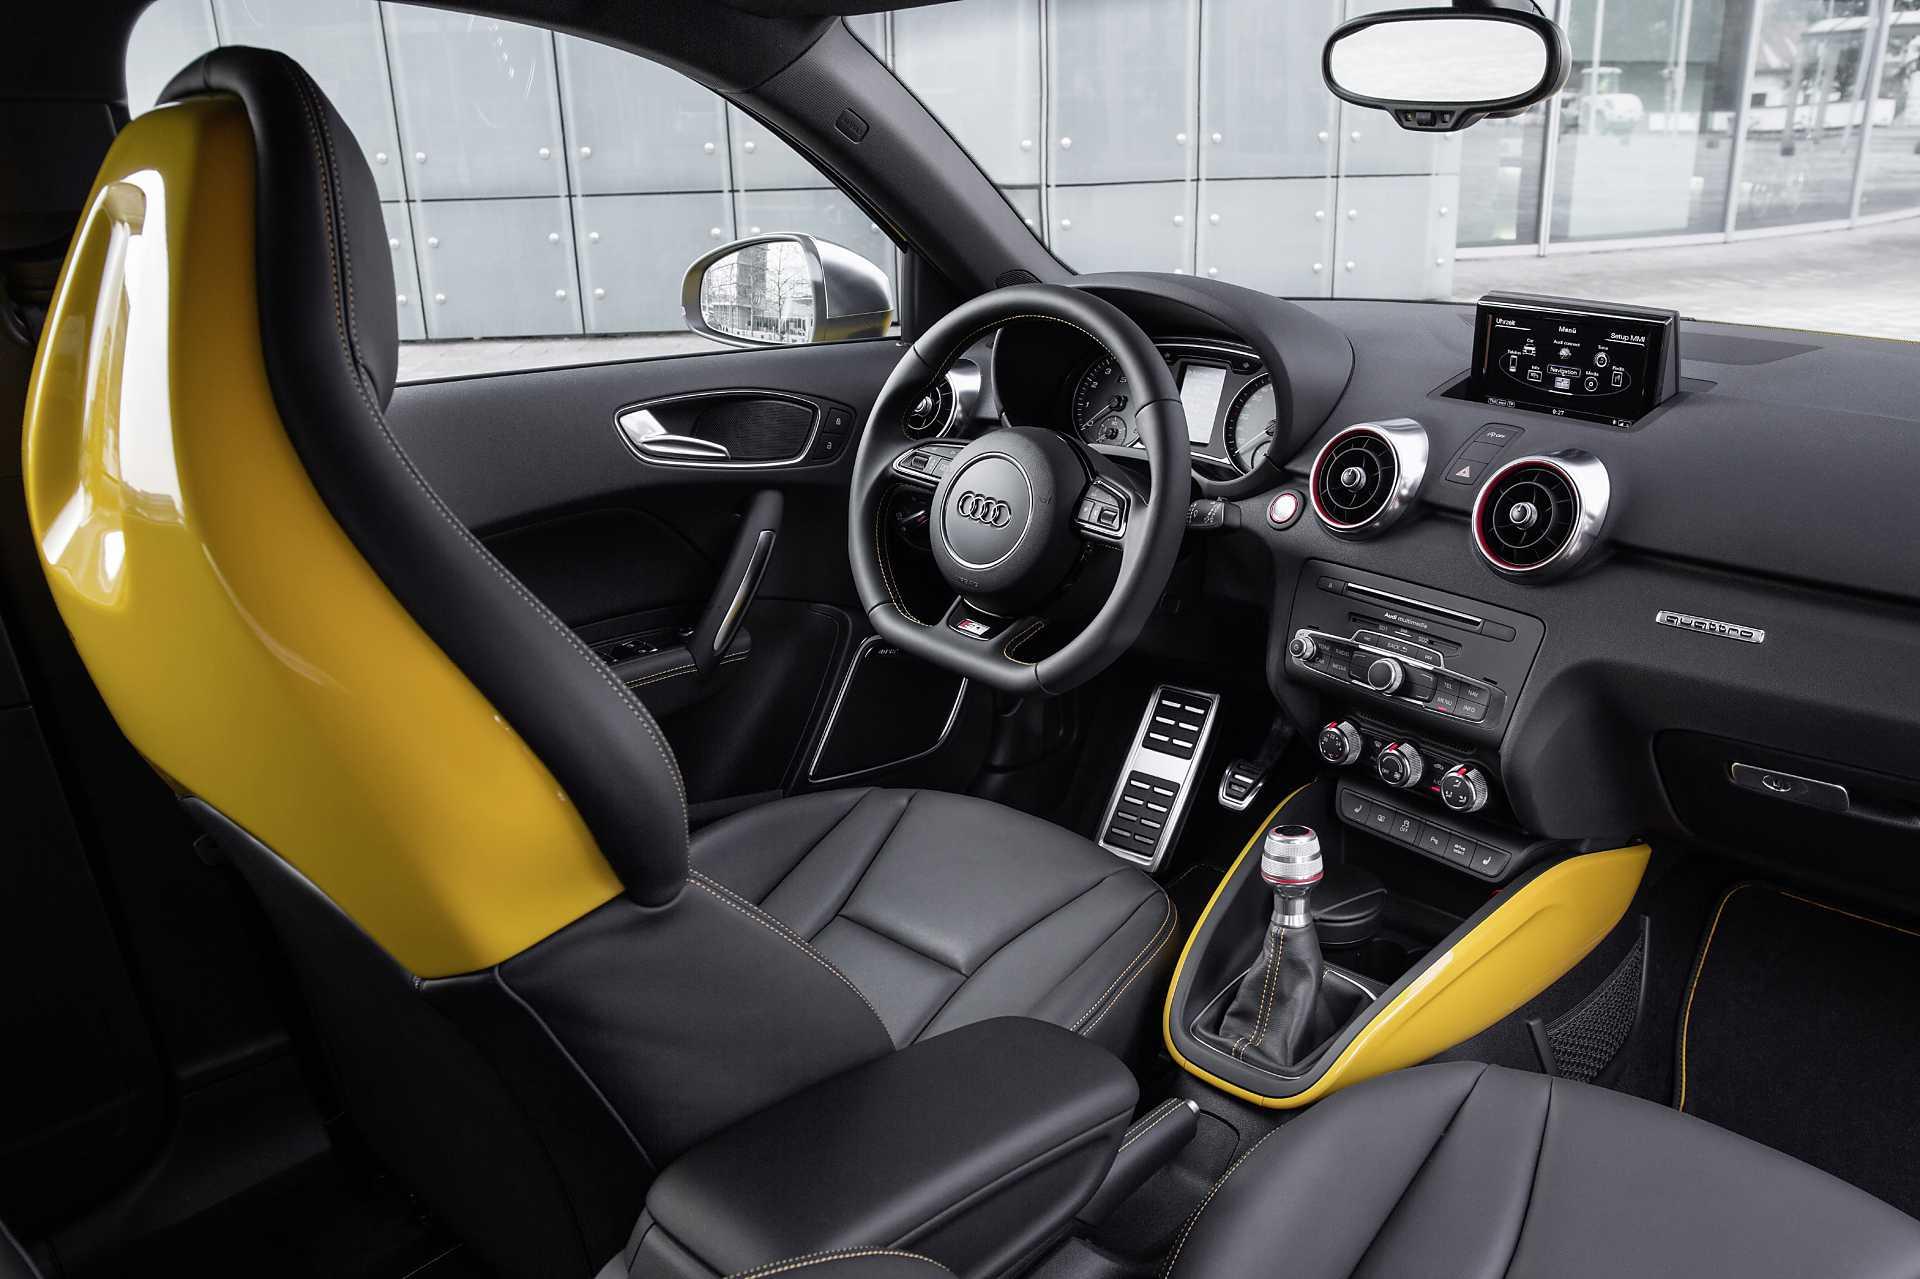 Audi S1 Sportback 2.0 TFSI quattro Manual, 231hp, 2014